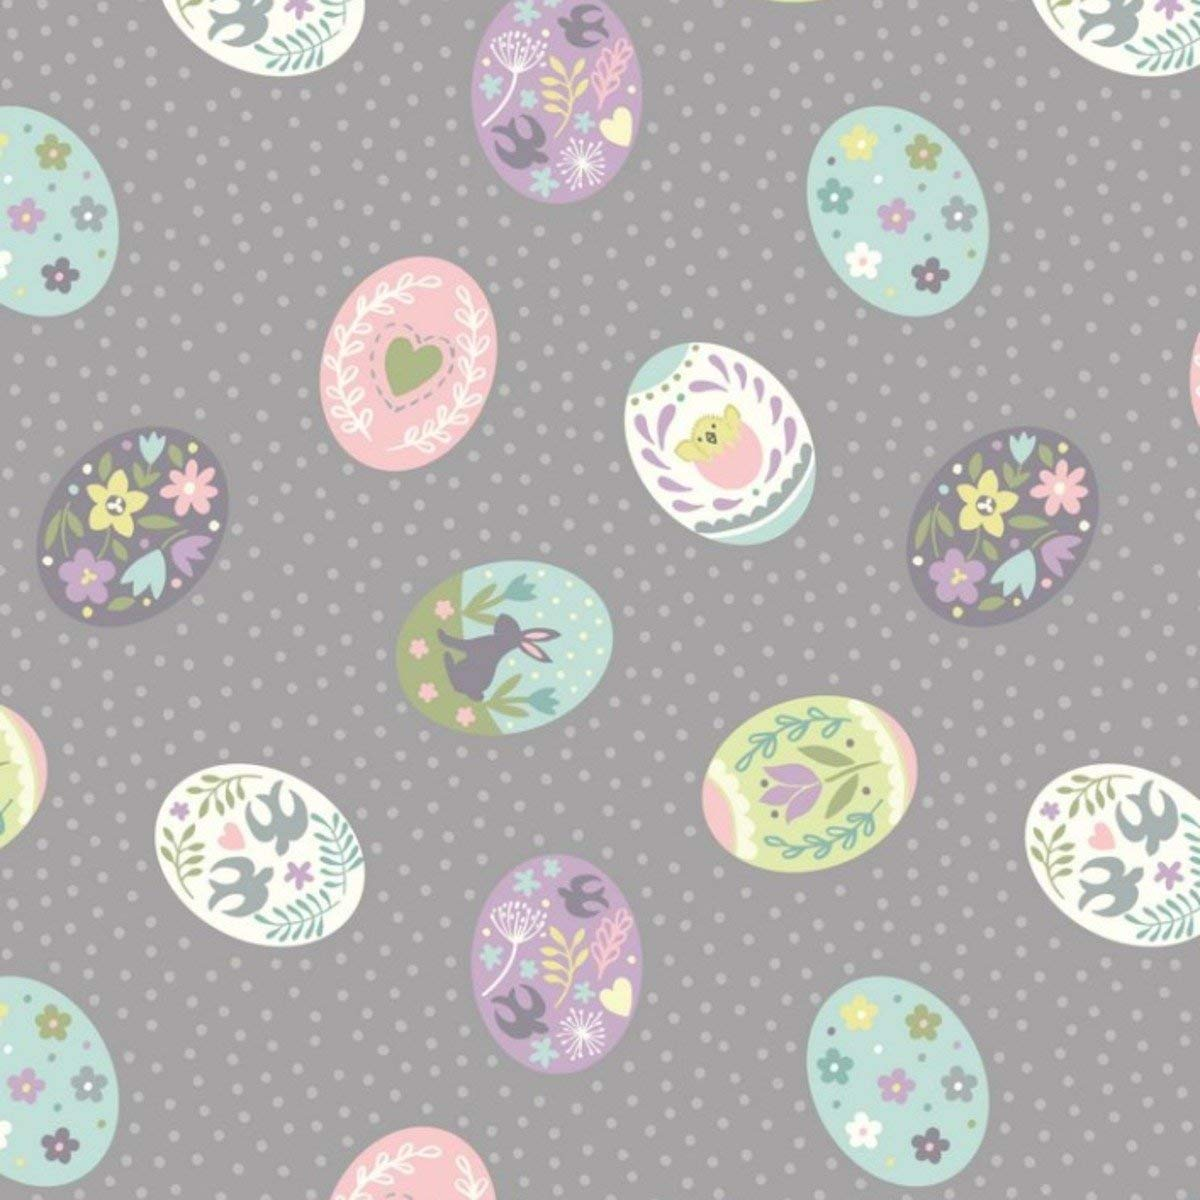 Rabbits white spring bunny mint flower pink FABRIC 100/% COTTON x PER HALF METRE